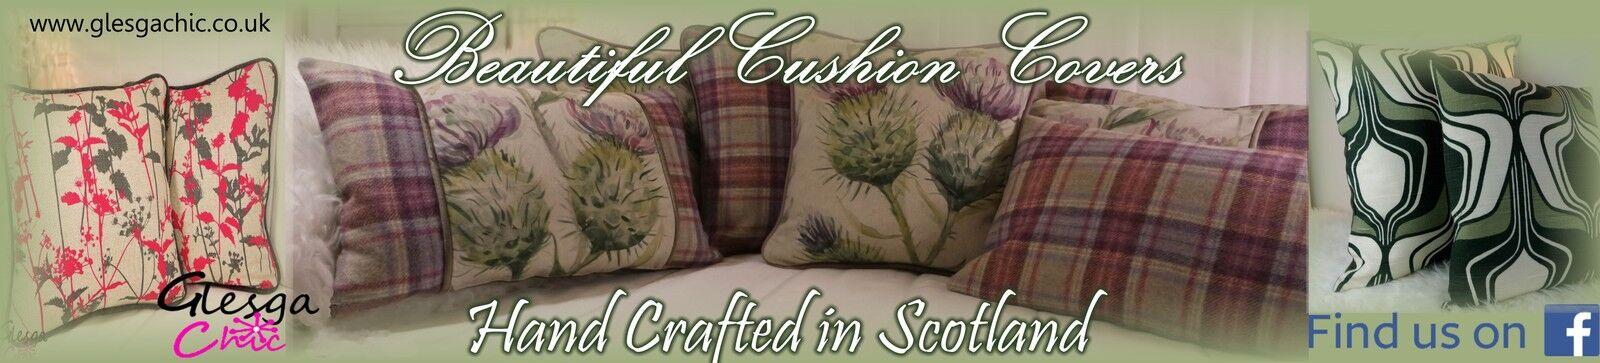 GlesgaChic Cushions Plus